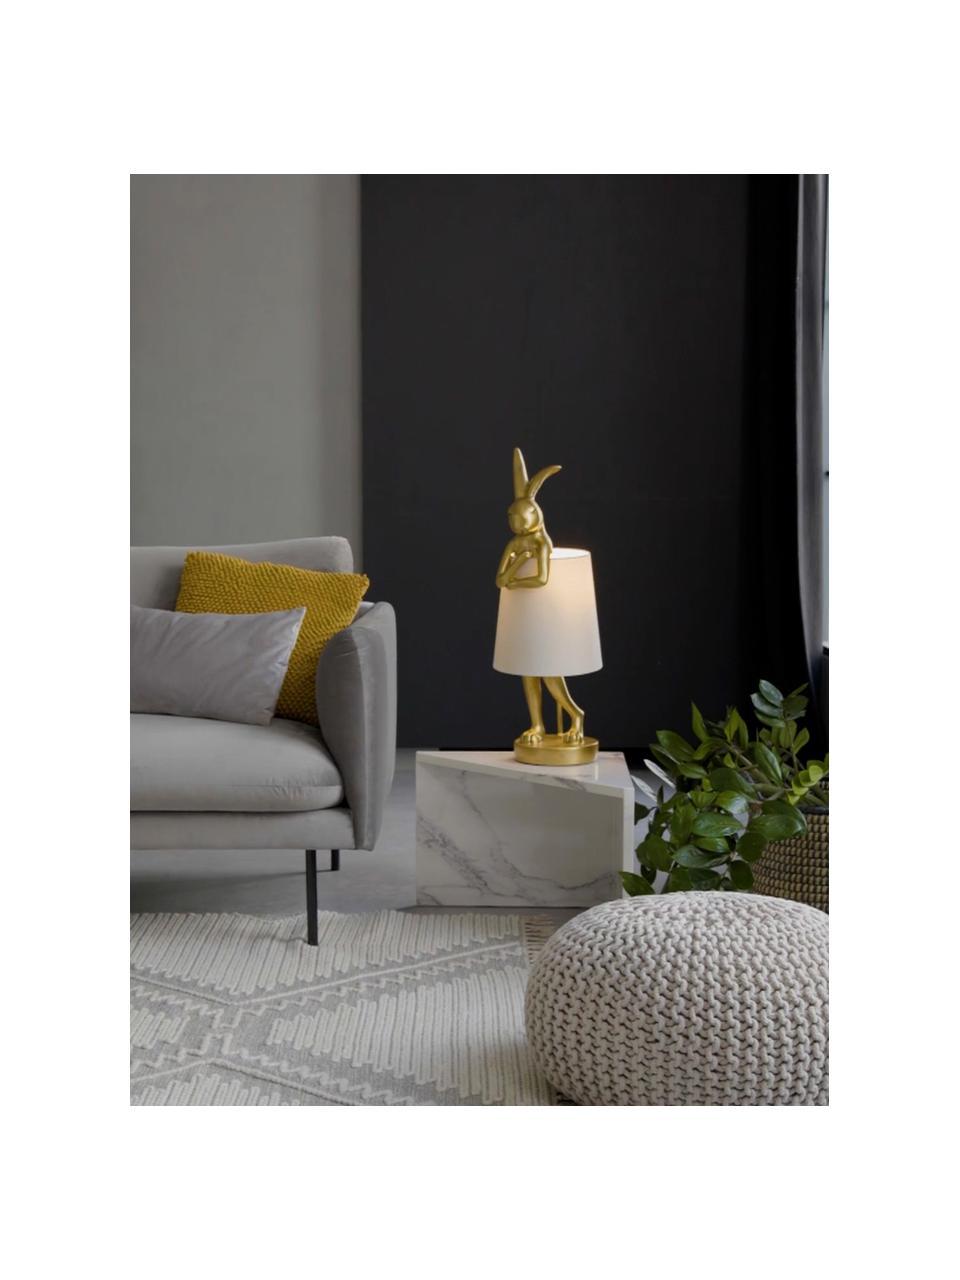 Grote design tafellamp Rabbit, Lampenkap: linnen, Lampvoet: polyresin, Stang: gepoedercoat staal, Wit, goudkleurig, Ø 23 x H 68 cm